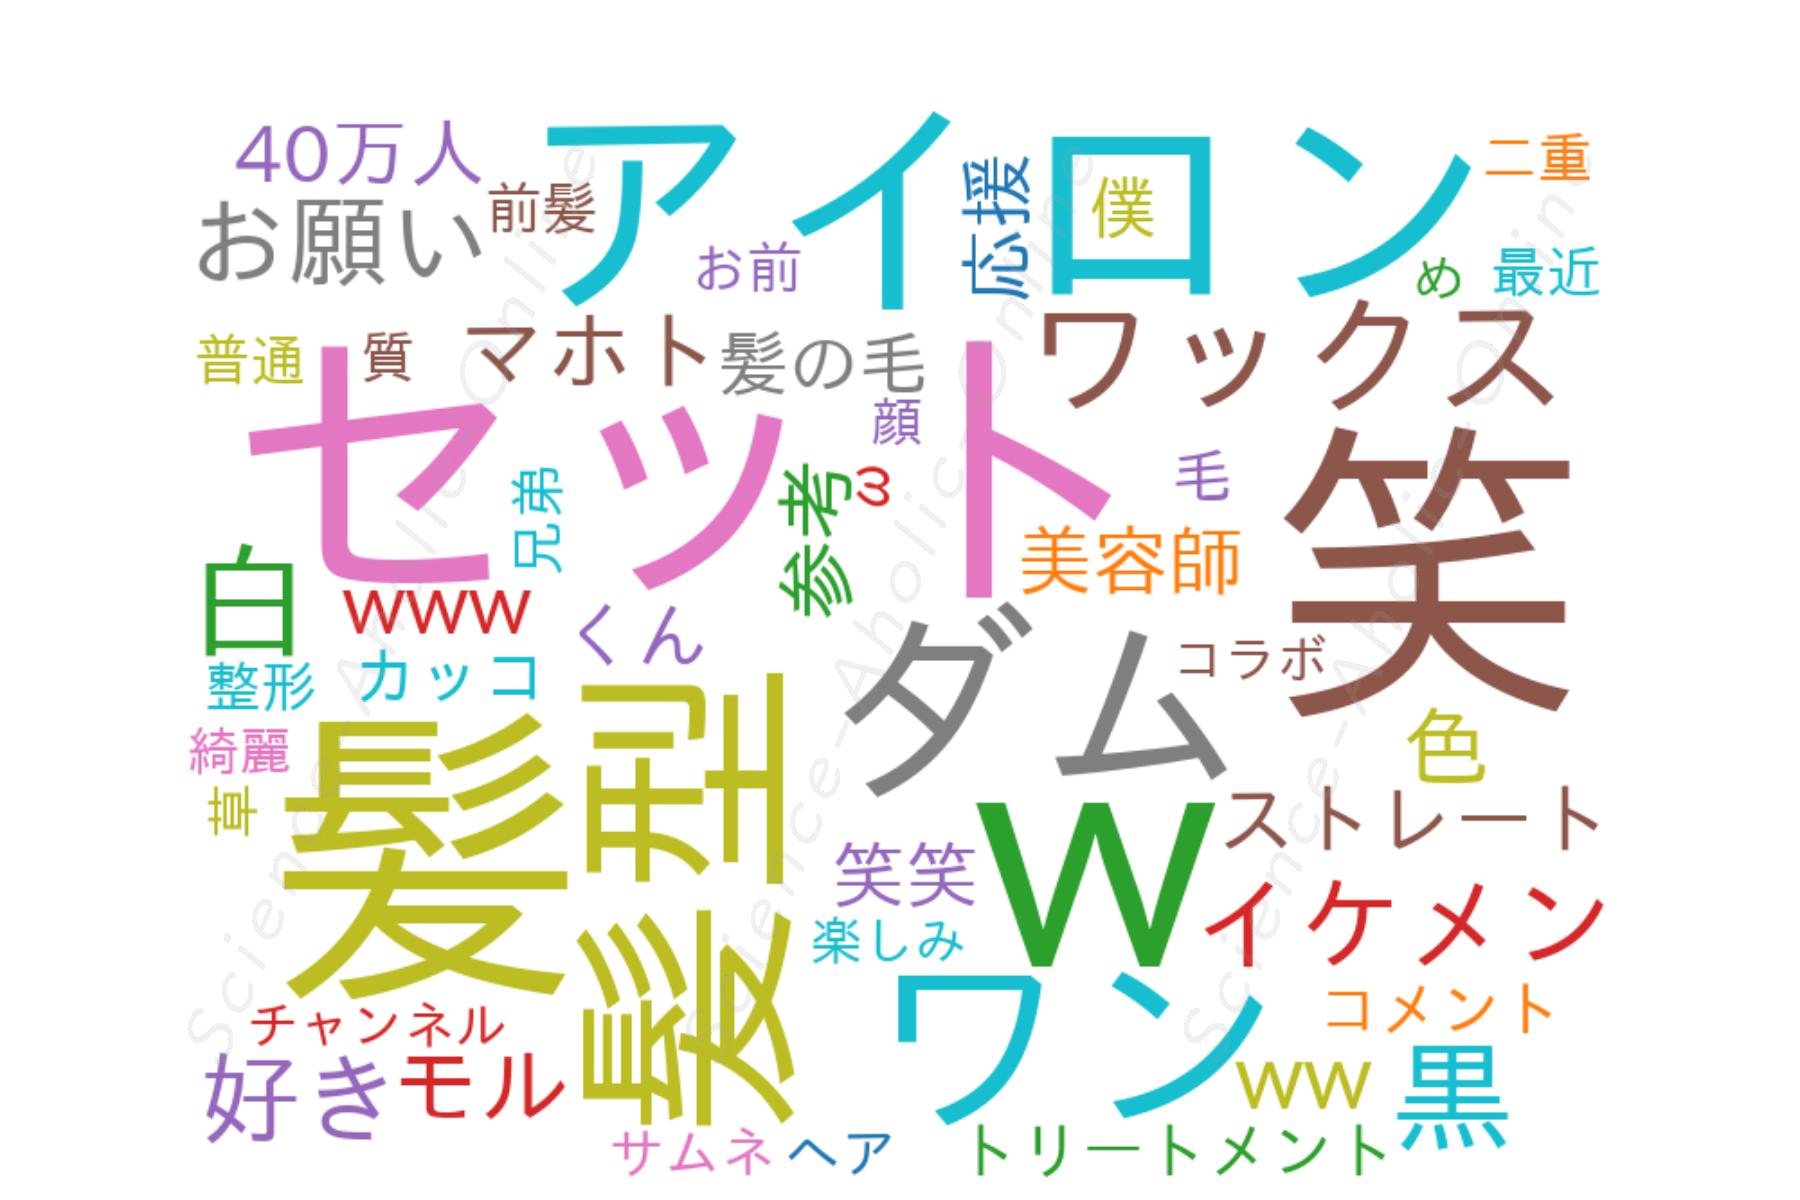 https://science-aholic-online.com/wp-content/uploads/2020/08/wordcloud_もるさん.png